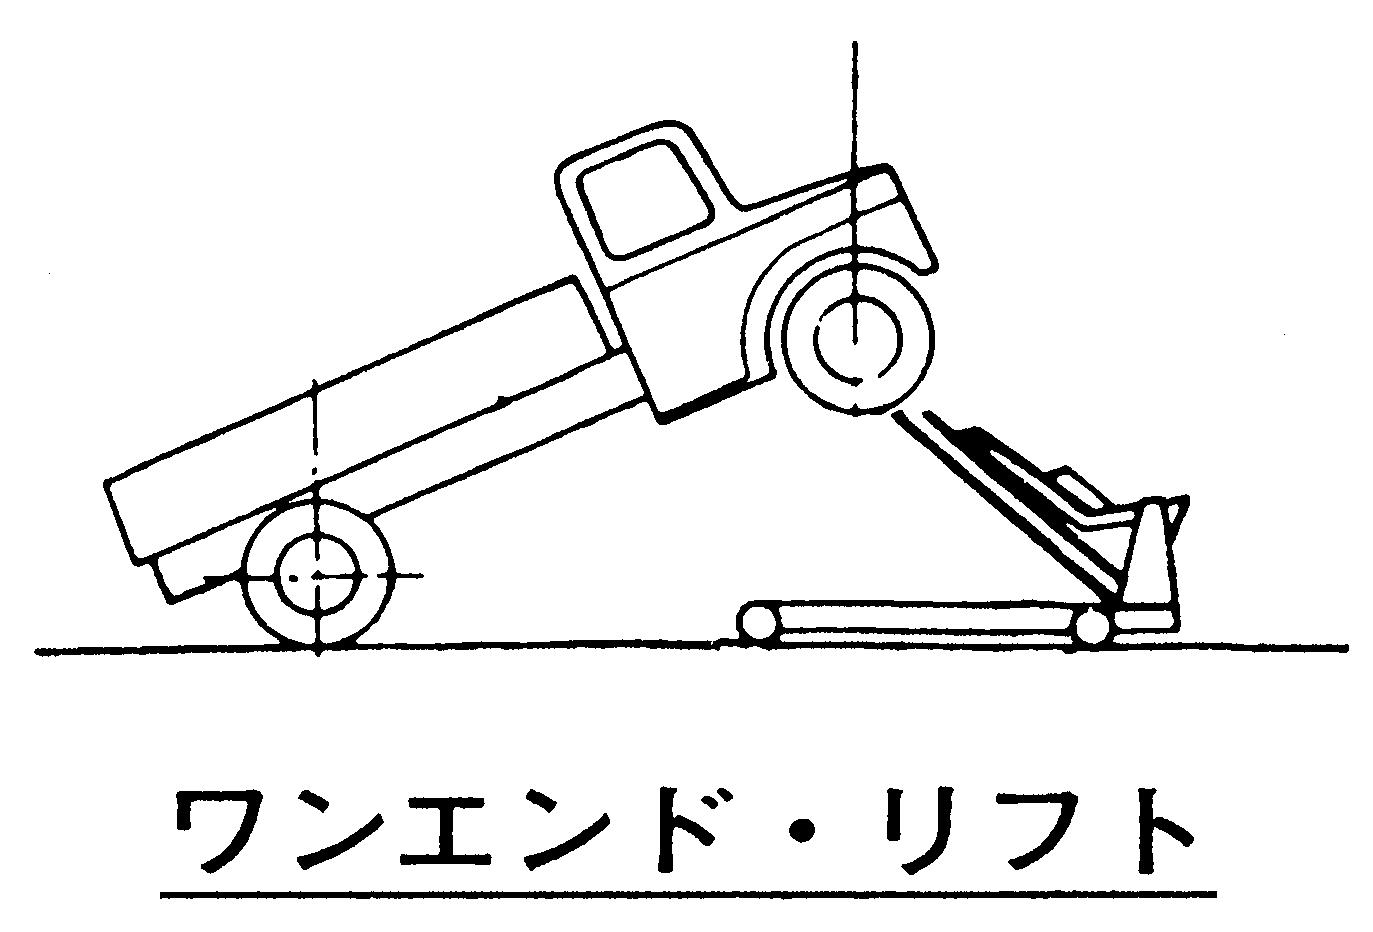 12202-1